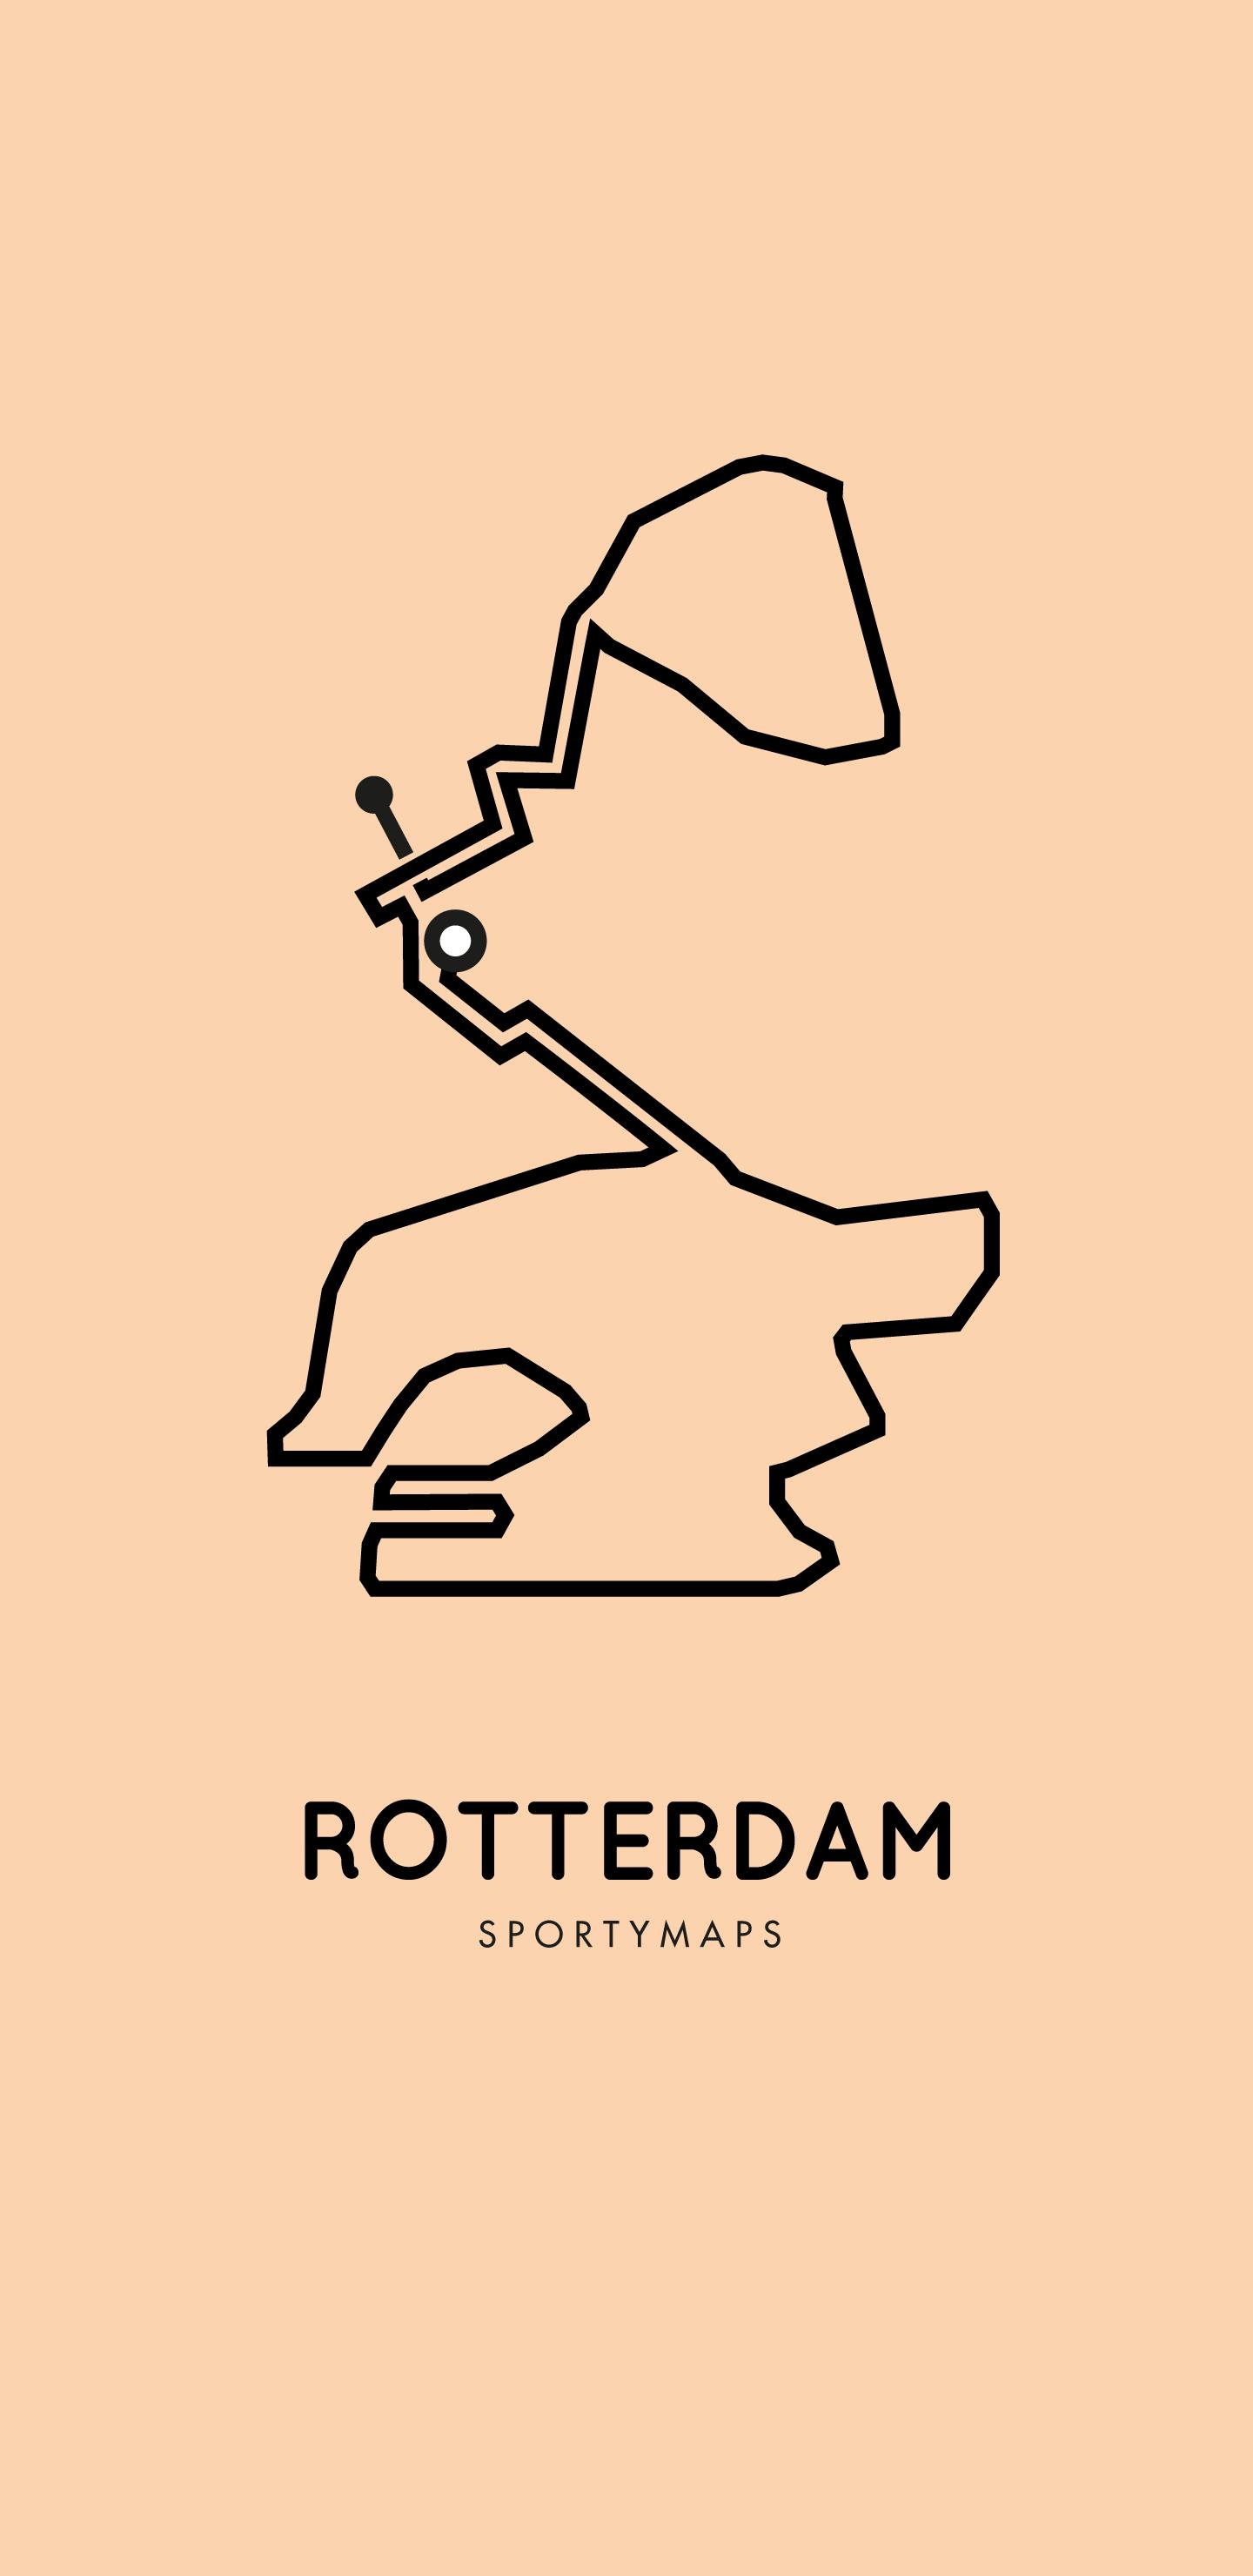 Sportymaps-Rotterdam-marathon-orange